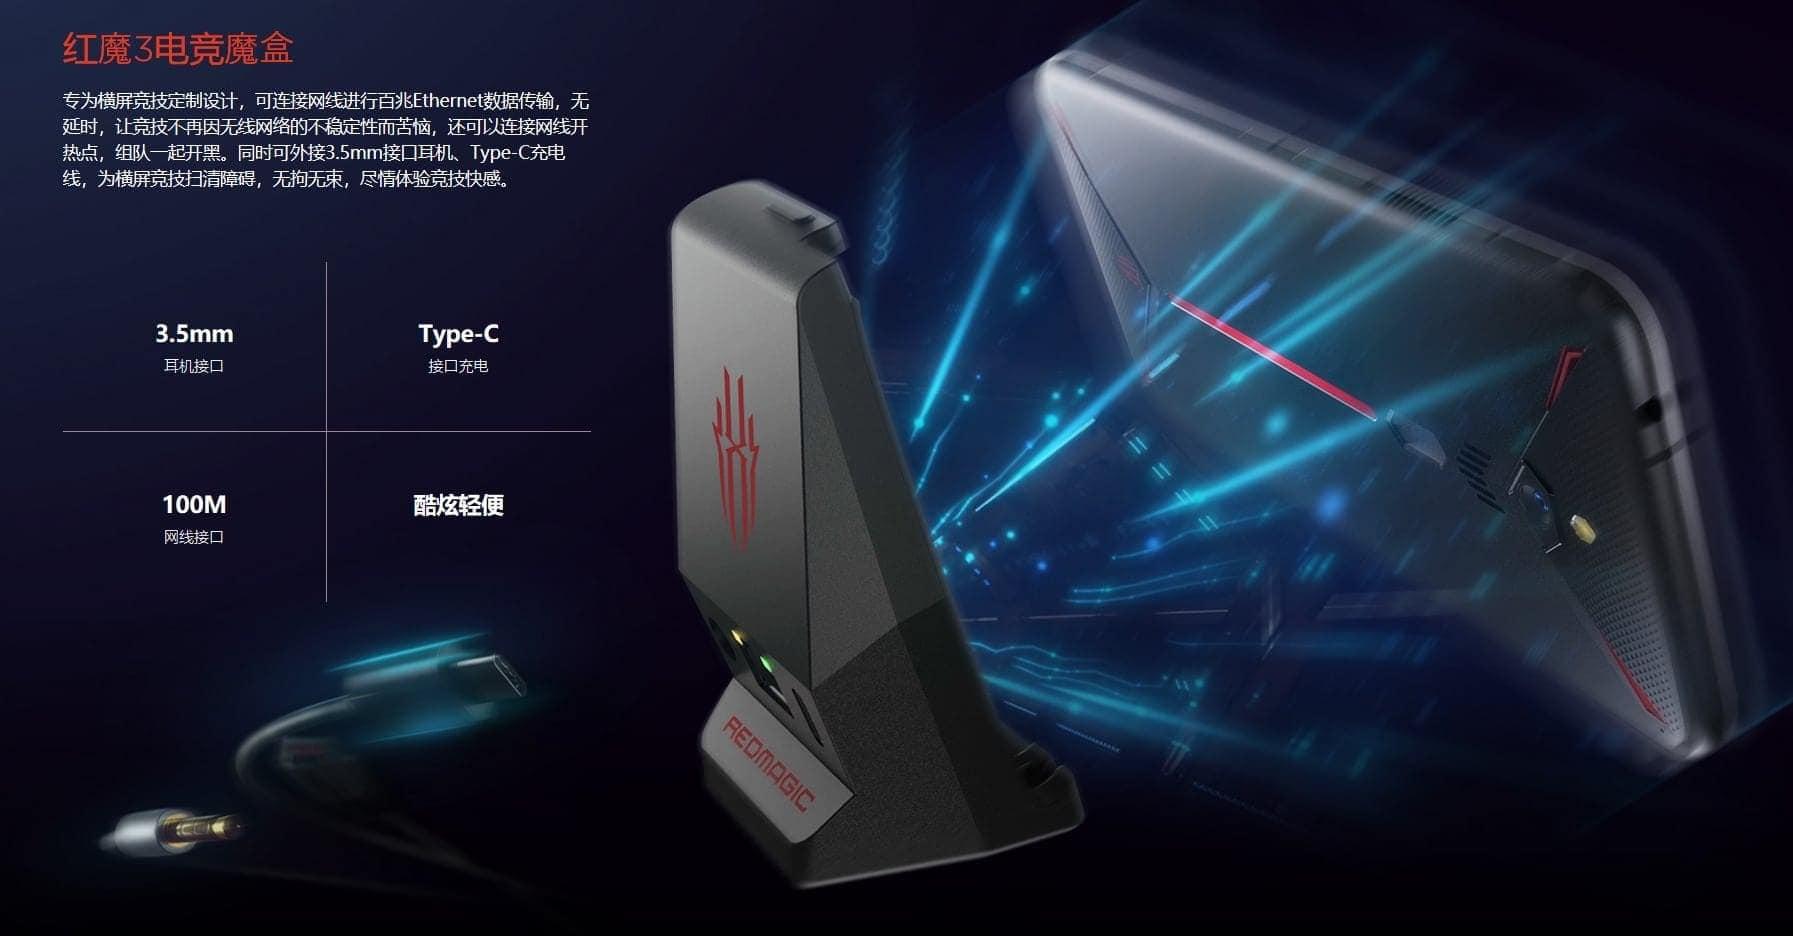 Nubia เปิดตัว Red Magic 3 มือถือเพื่อการเล่นเกม ใช้ SNAP855 จอ 90 Hz มีพัดลมระบายอากาศ 5